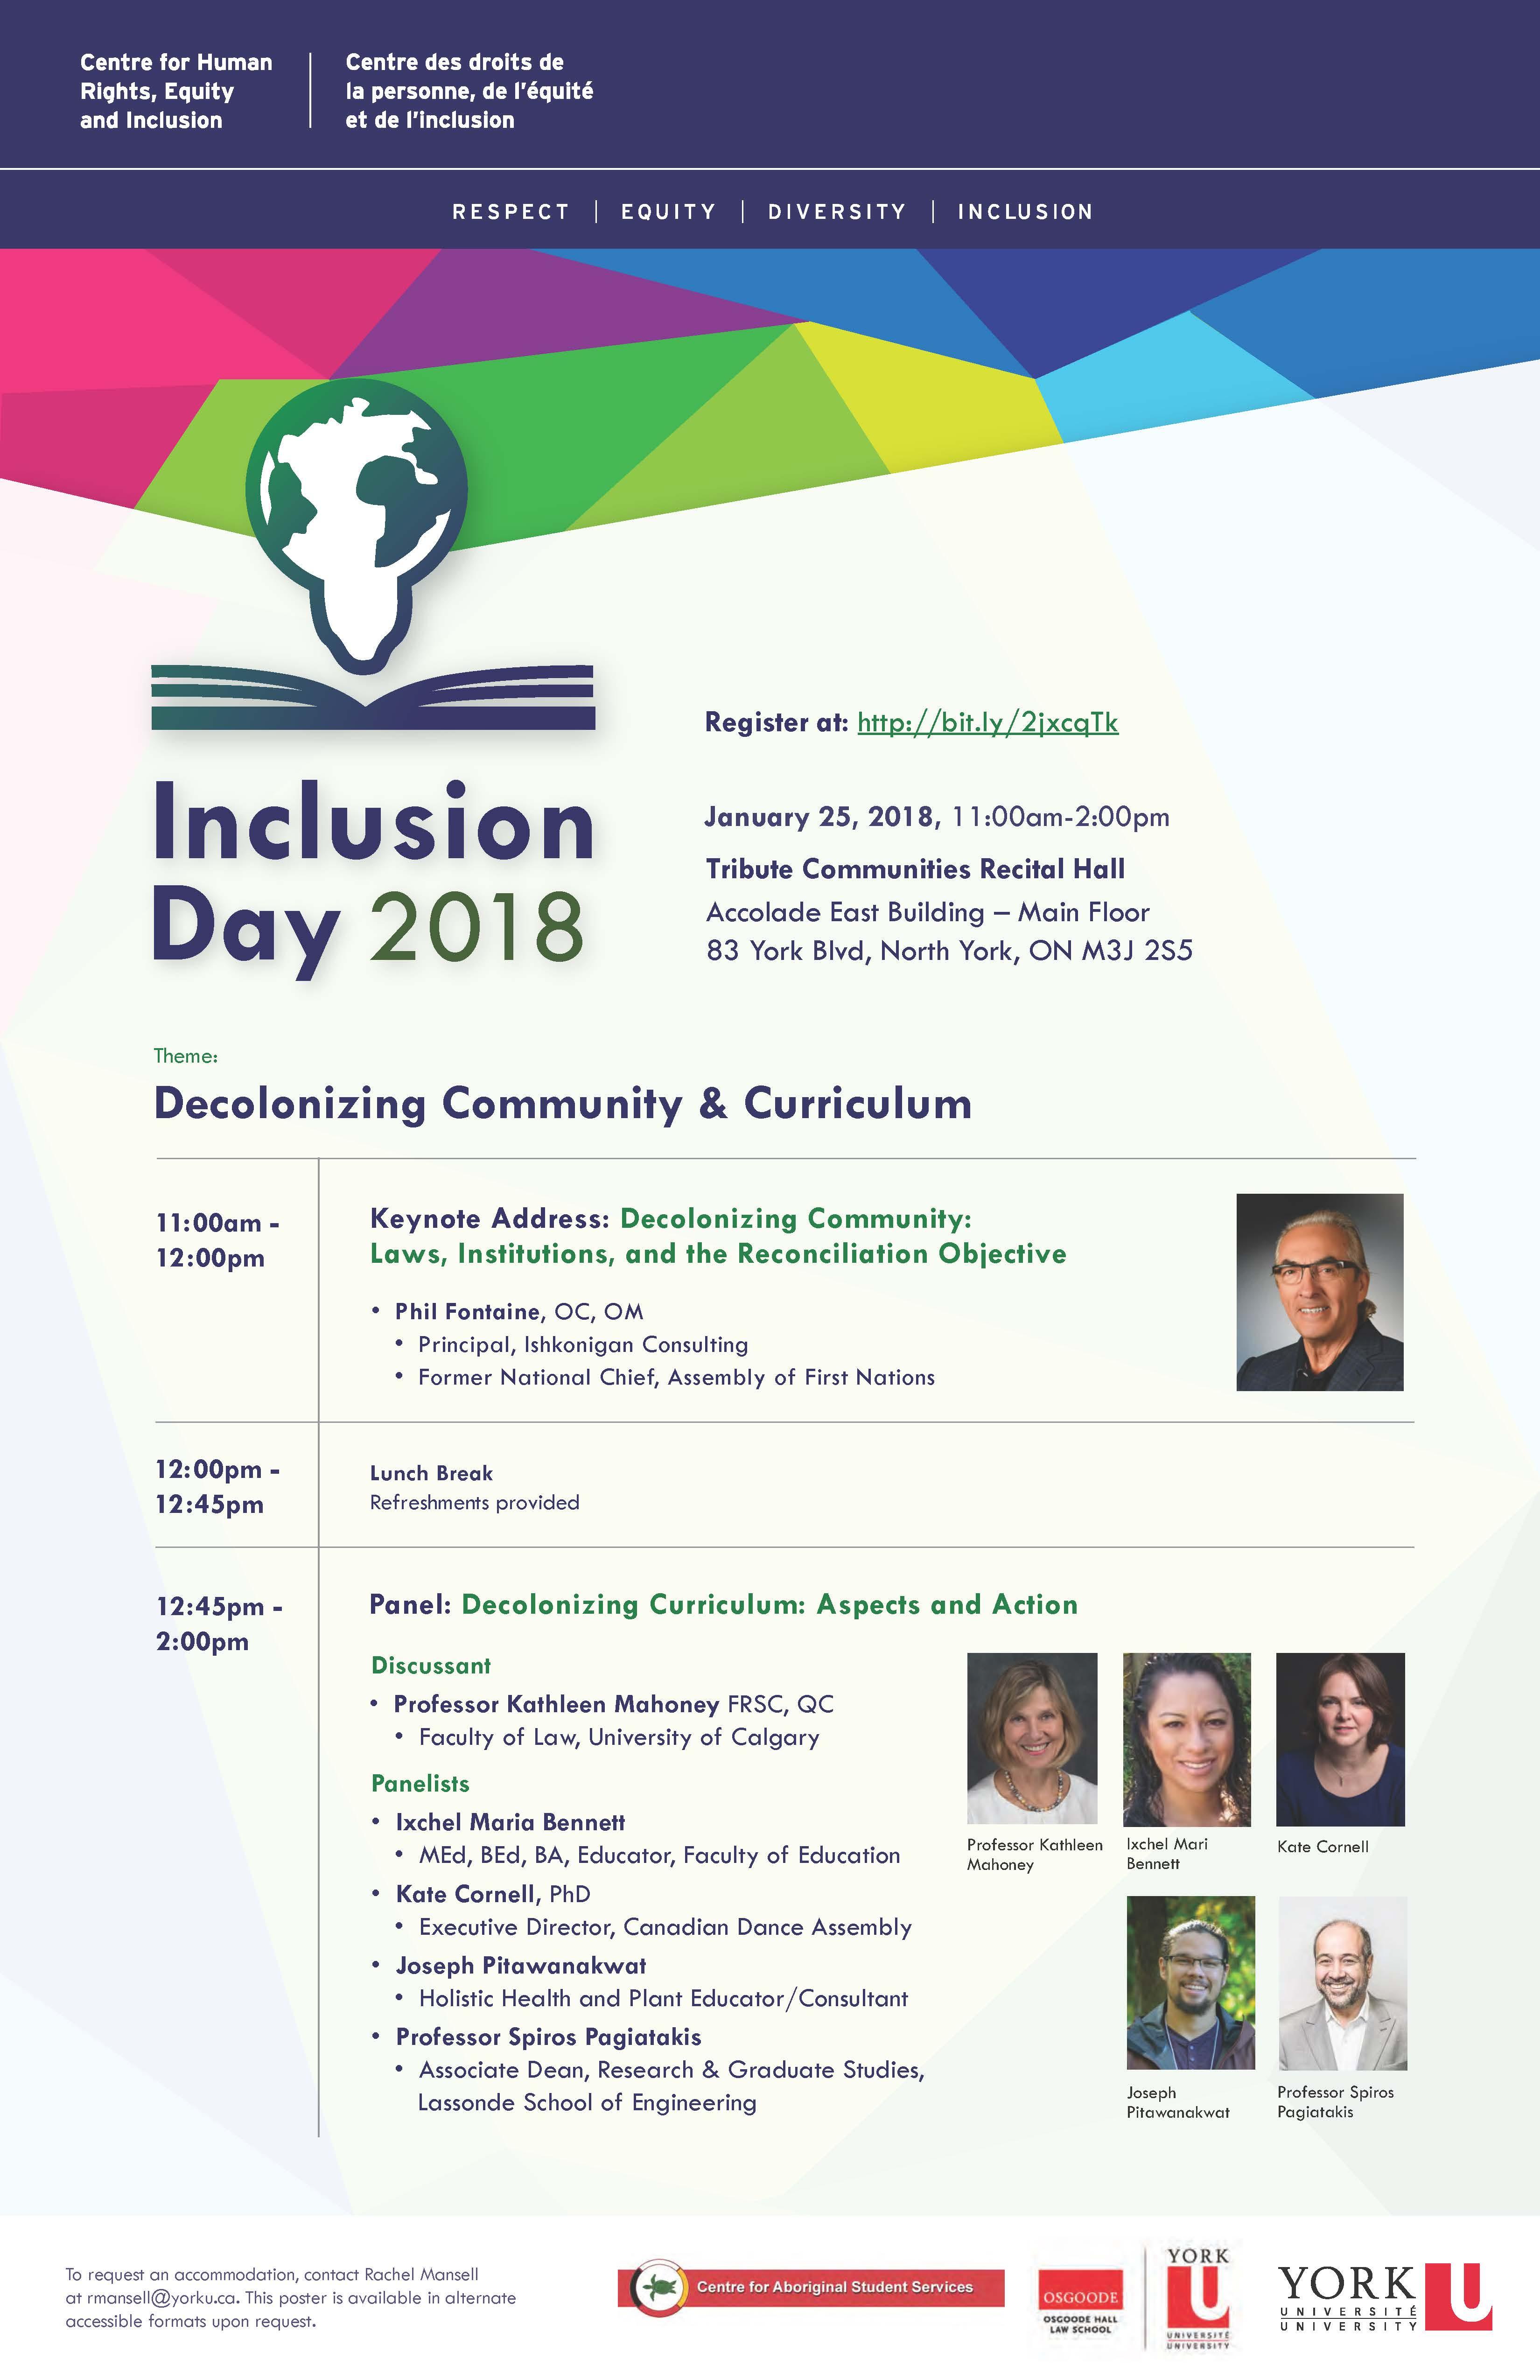 Inclusion Day 2018